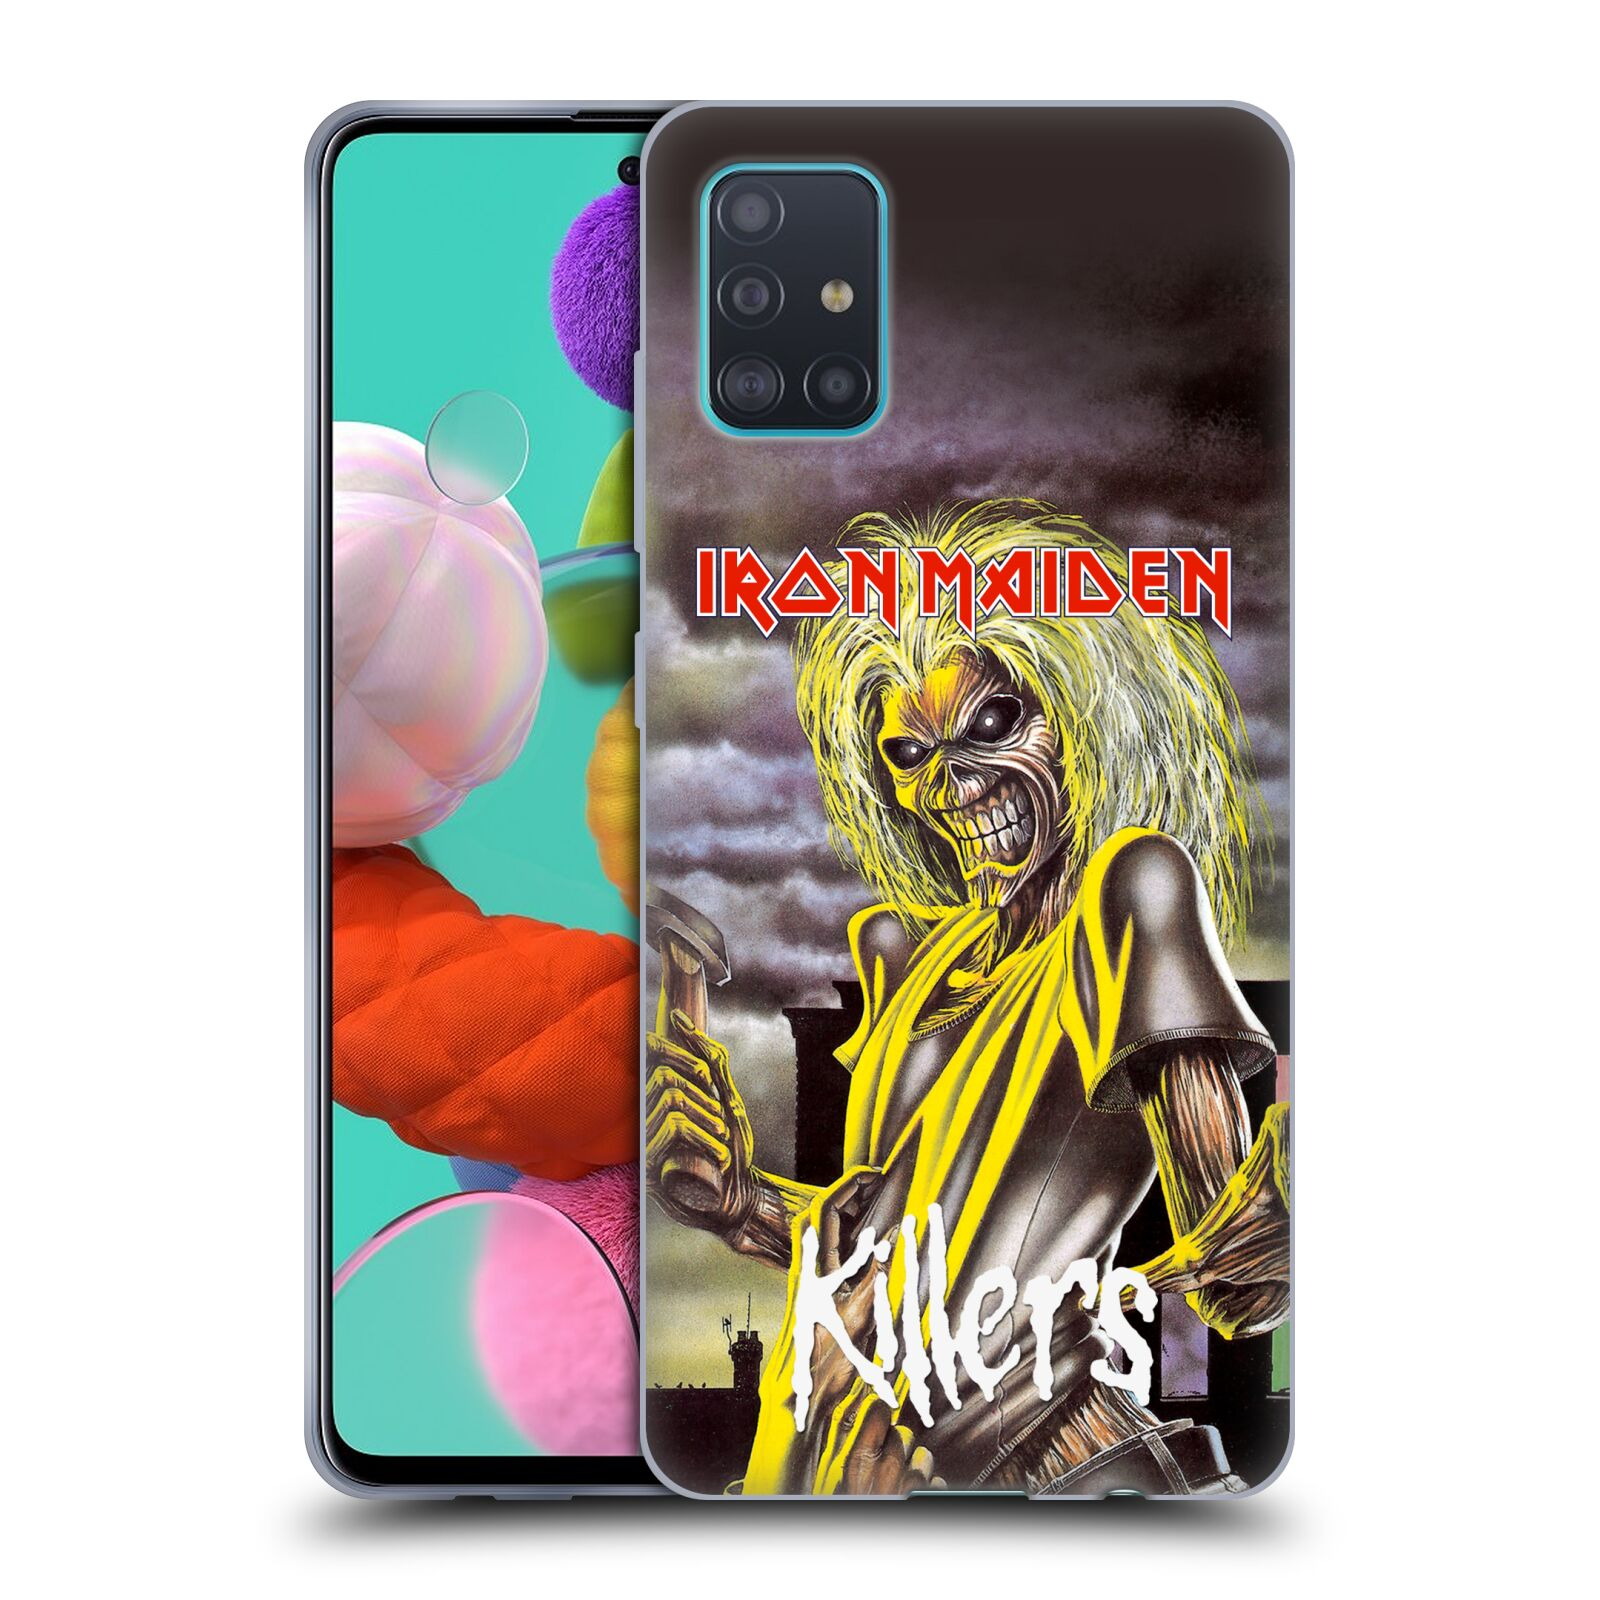 Silikonové pouzdro na mobil Samsung Galaxy A51 - Head Case - Iron Maiden - Killers